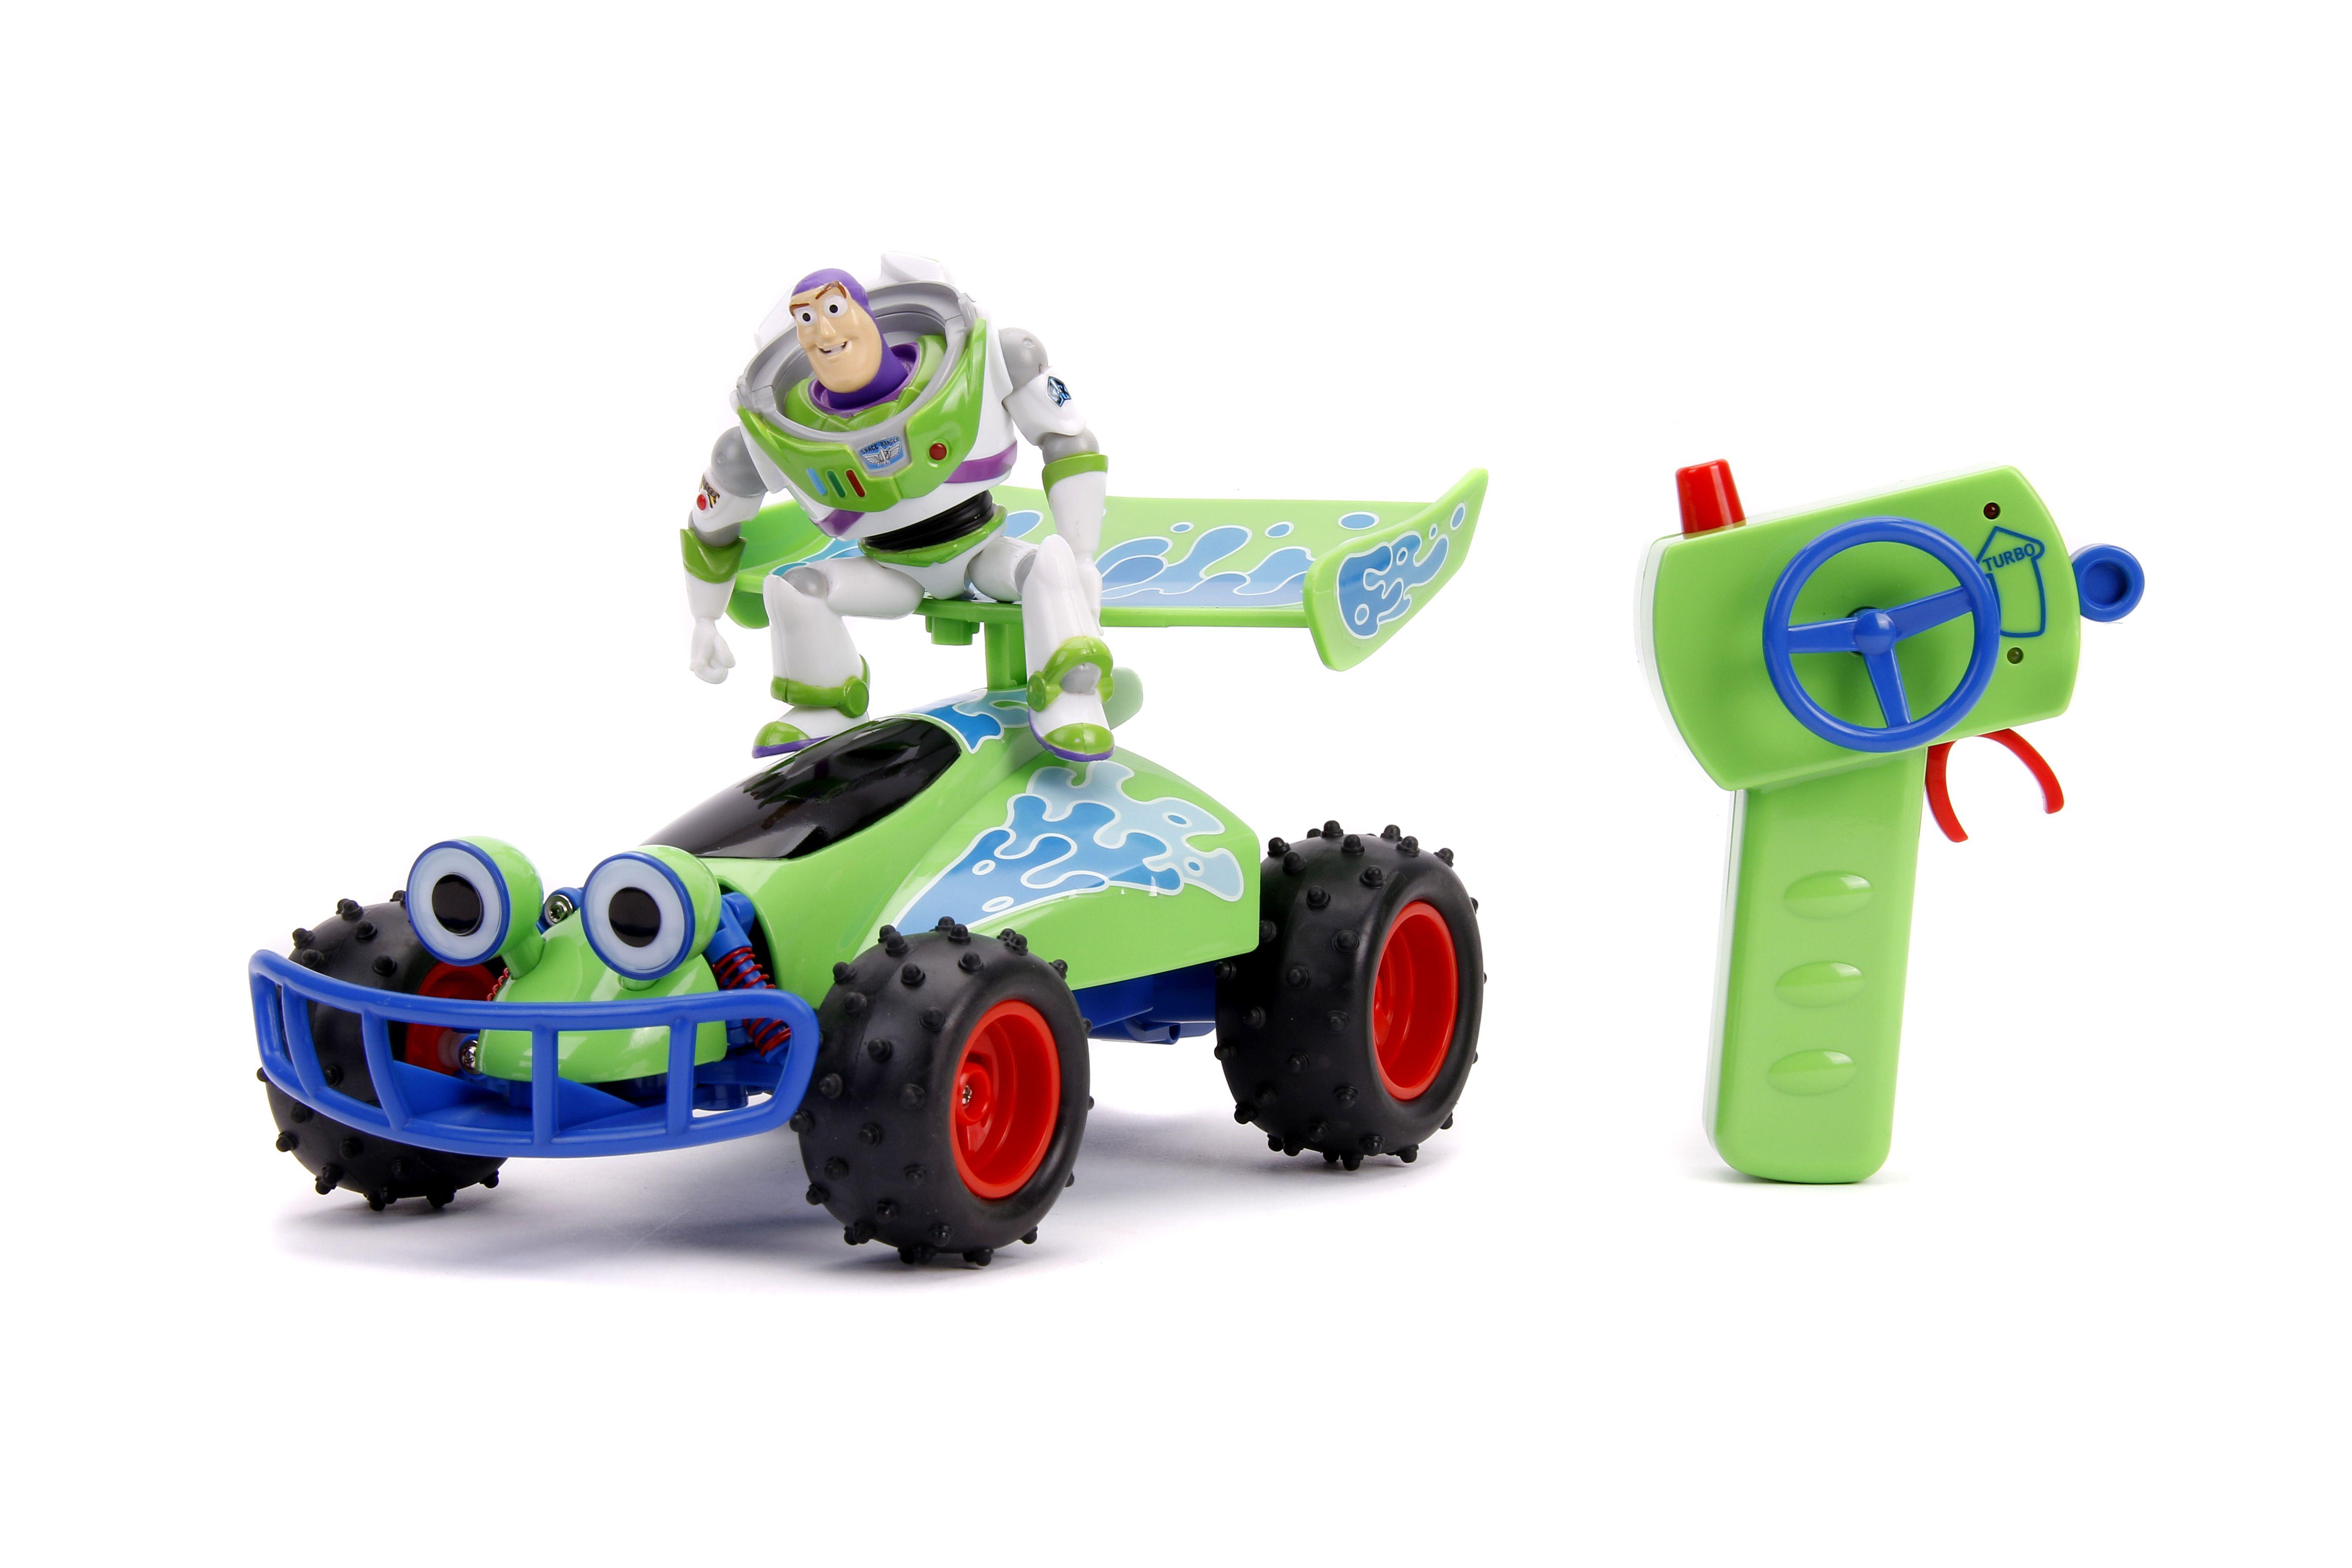 Disney Pixar Toy Story 4 Rc Crash Buggy Buzz Lightyear Remote Control Car Walmart Com Pixar Toys Toy Story Jada Toys